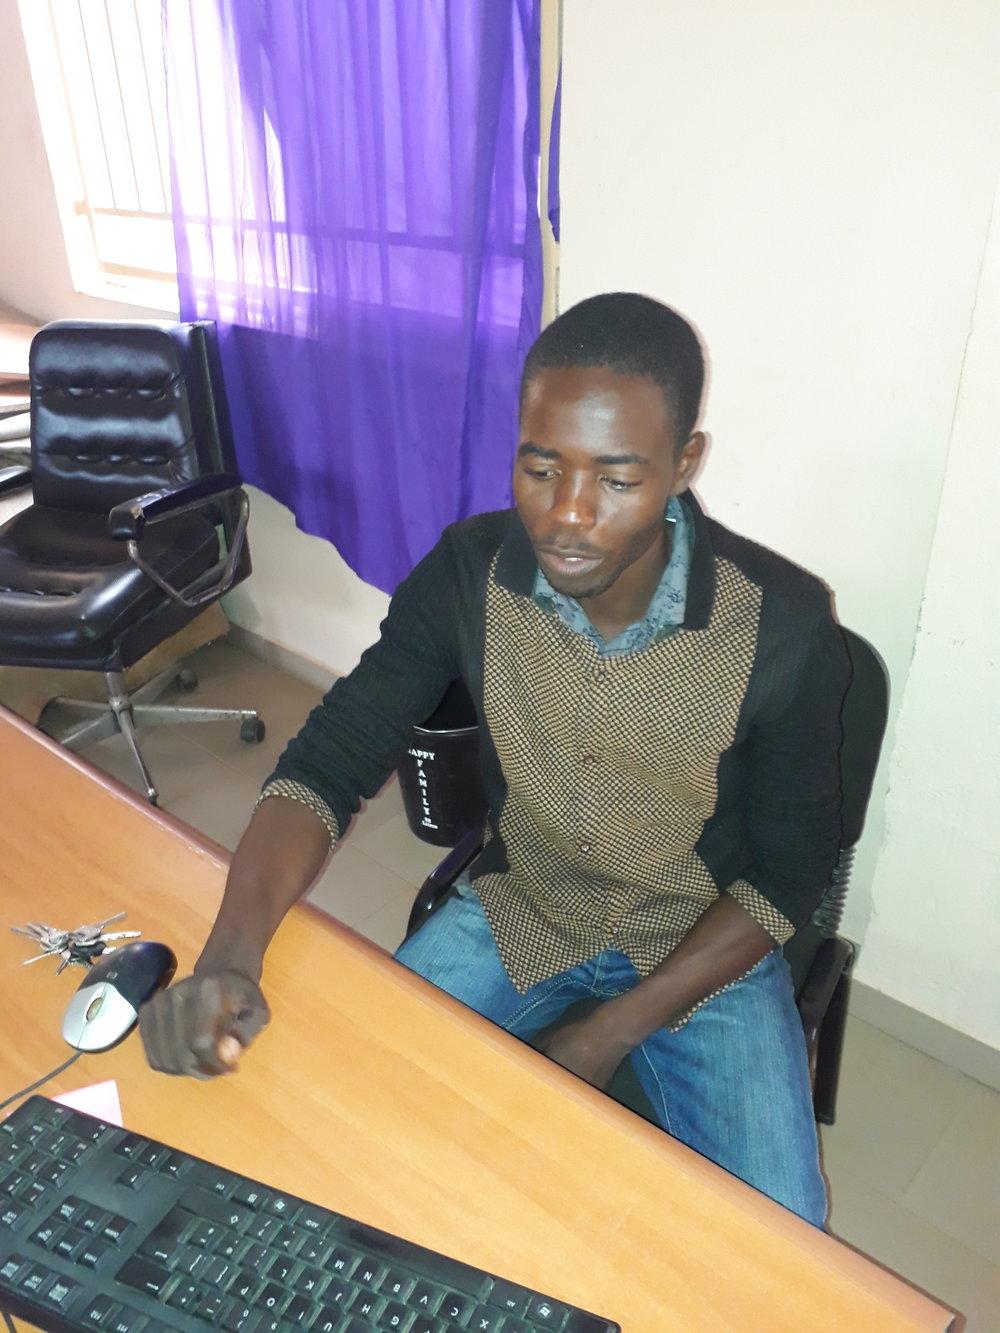 Okosis Dashe, Utility manager, IMC. Mobile number: 07062157774. Email: okosisidashe@gmail.com